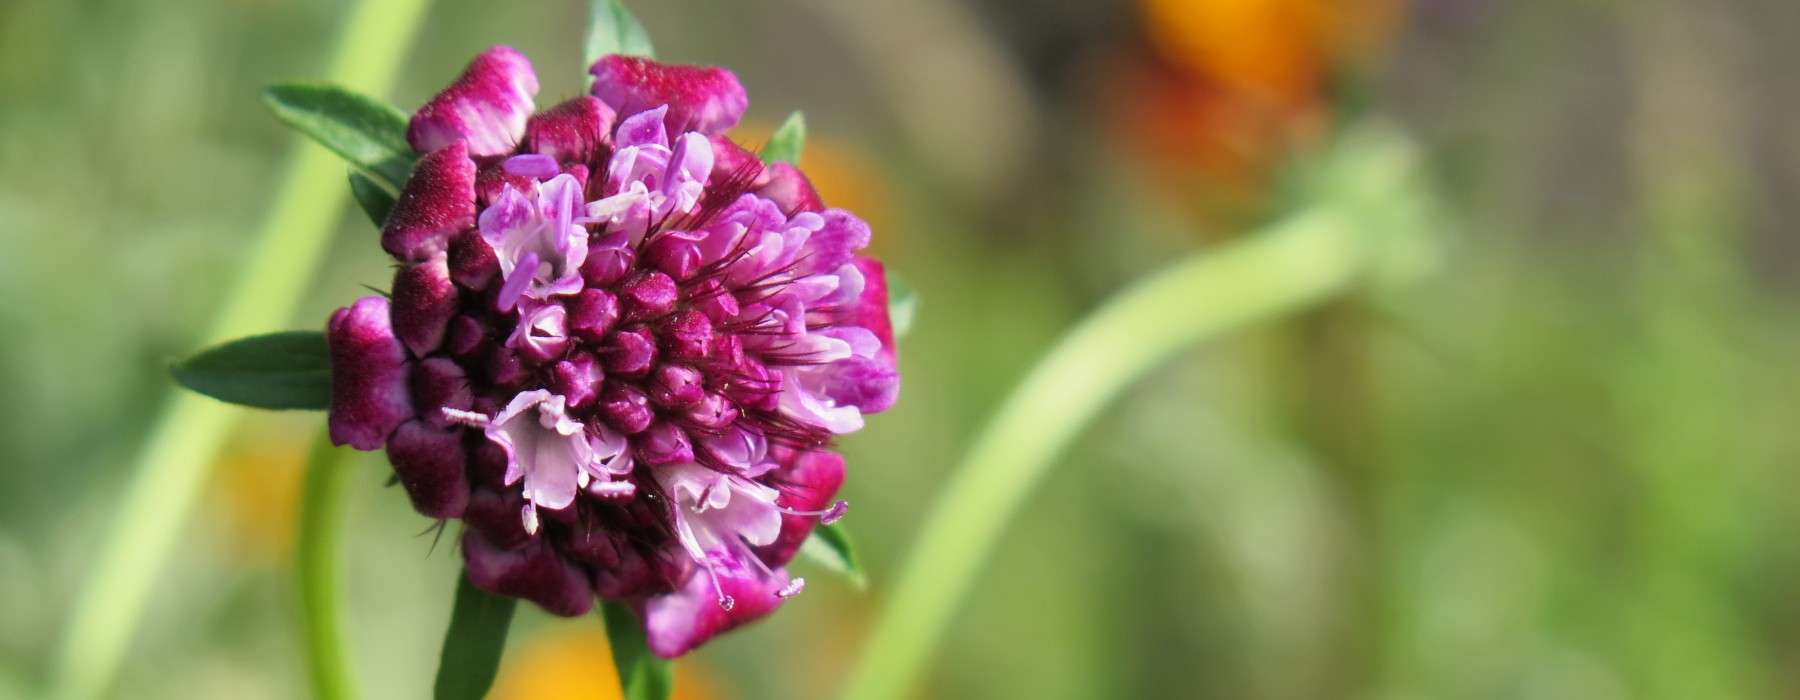 Homegrown Flowers